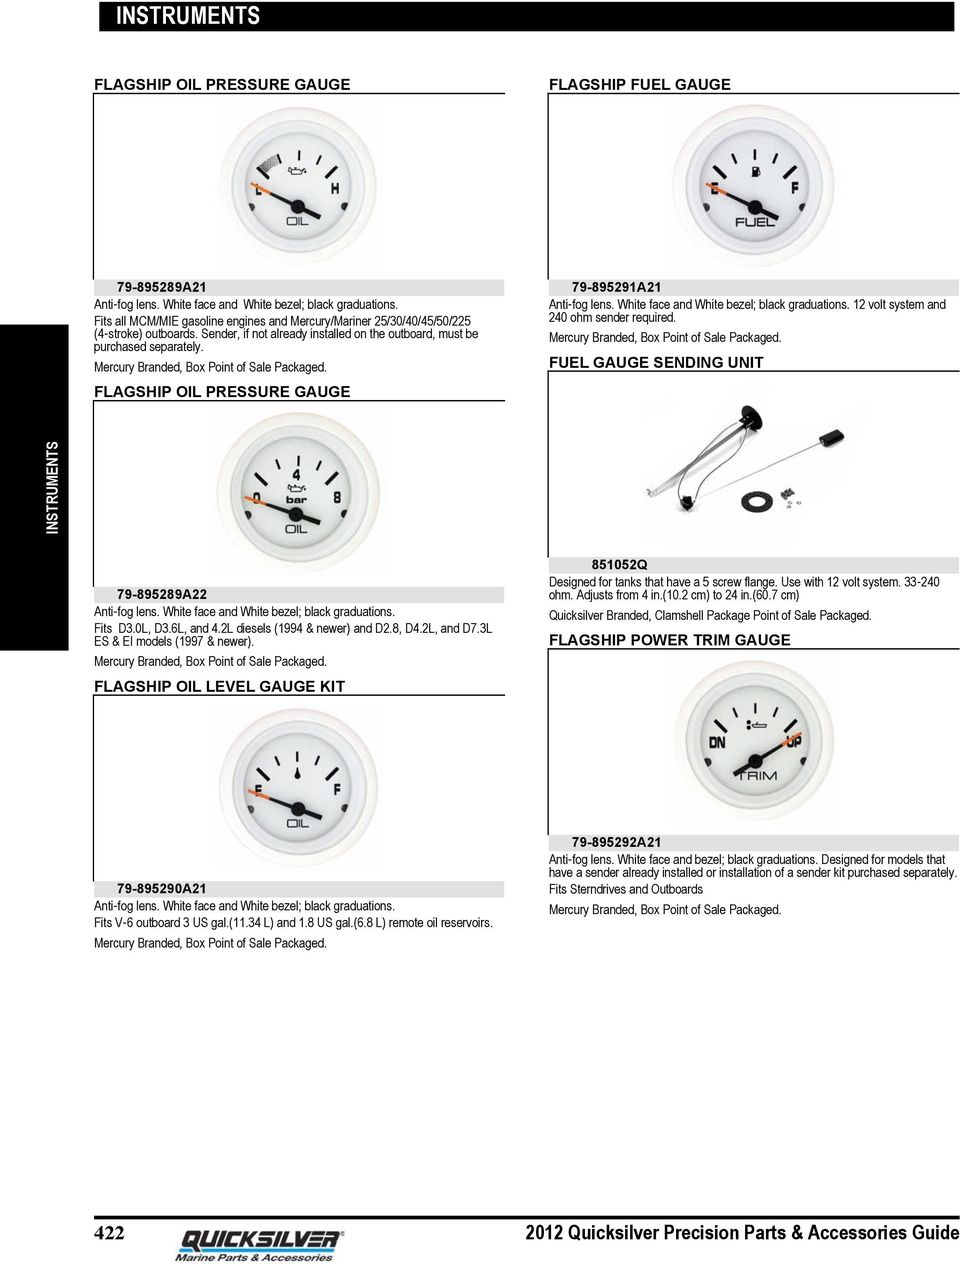 hight resolution of flagship oil pressure gauge 79 895291a21 anti fog lens white face and white bezel